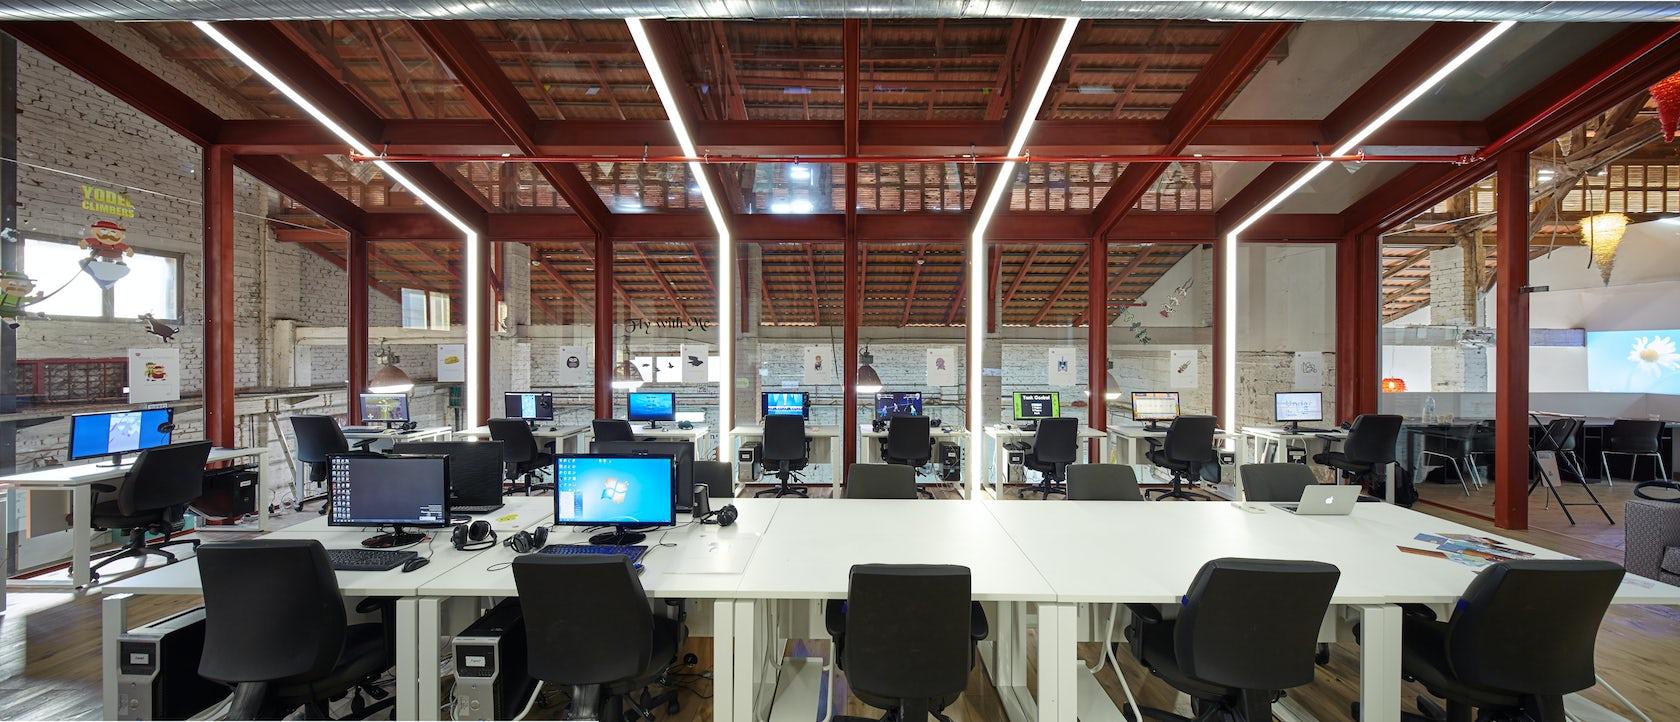 The Glass Gallery Shenkar College The Kadar Media Lab Building On Architizer